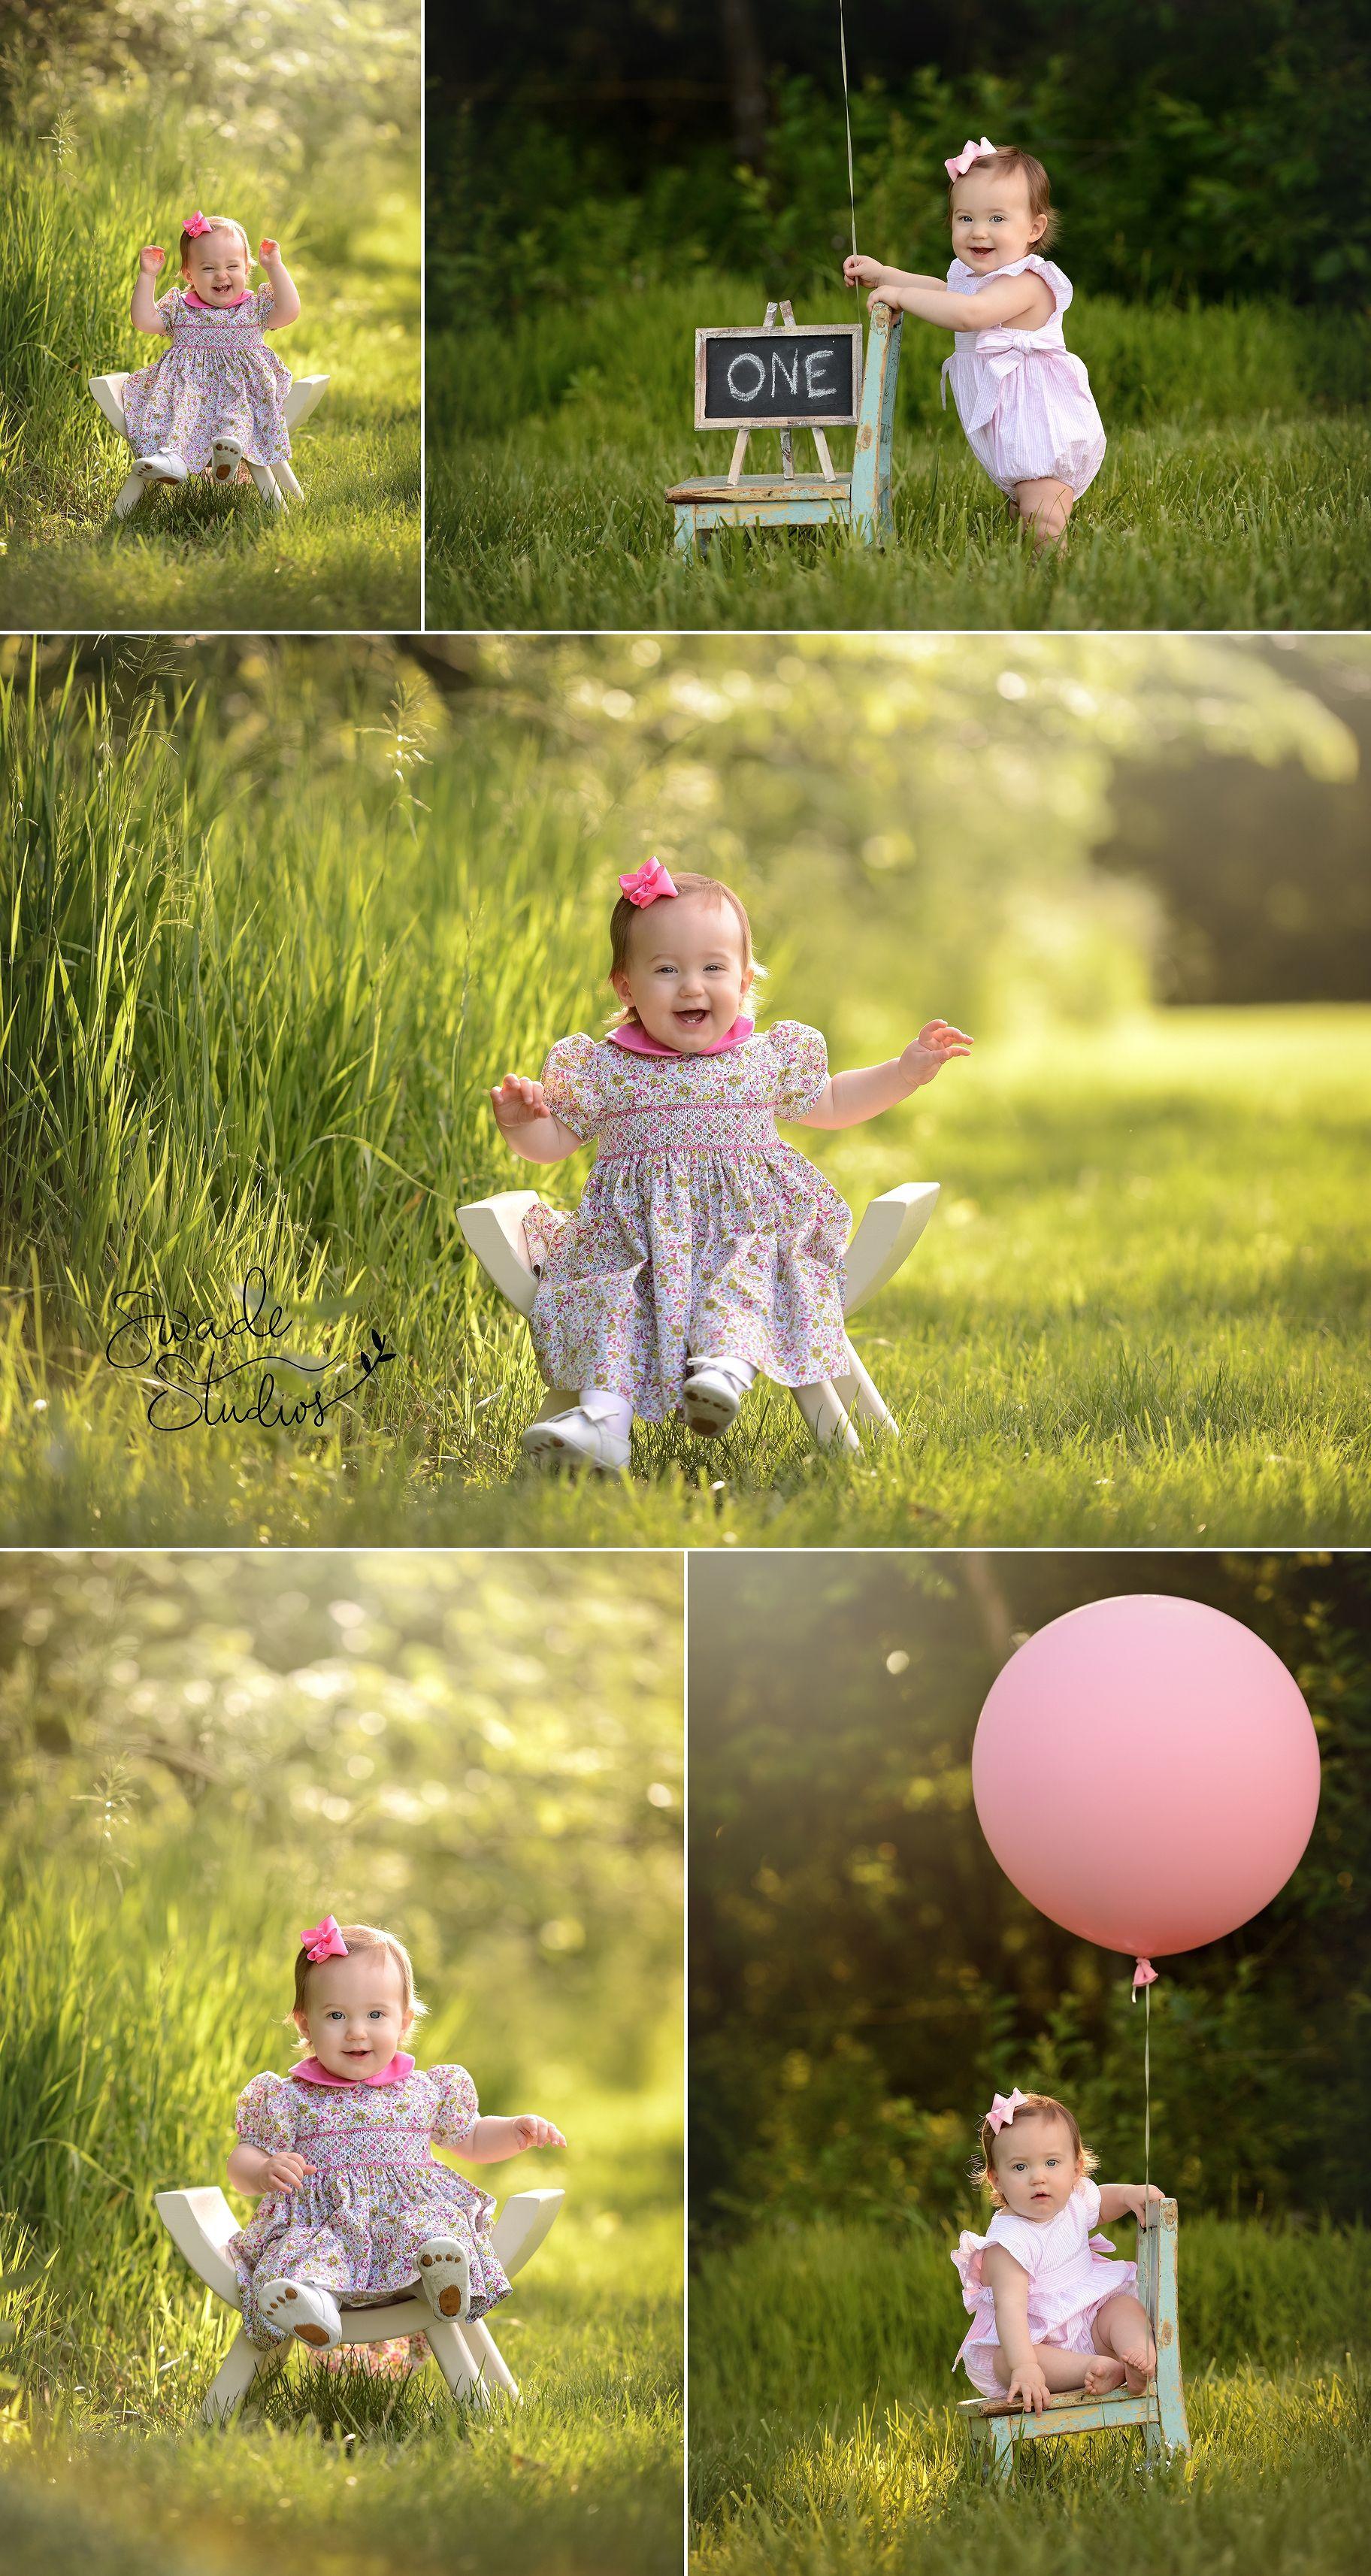 Baby Girl Photoshoot Outdoor : photoshoot, outdoor, First, Birthday, Photo, Shoot, Photoshoot, Girl,, Photoshoot,, Photos